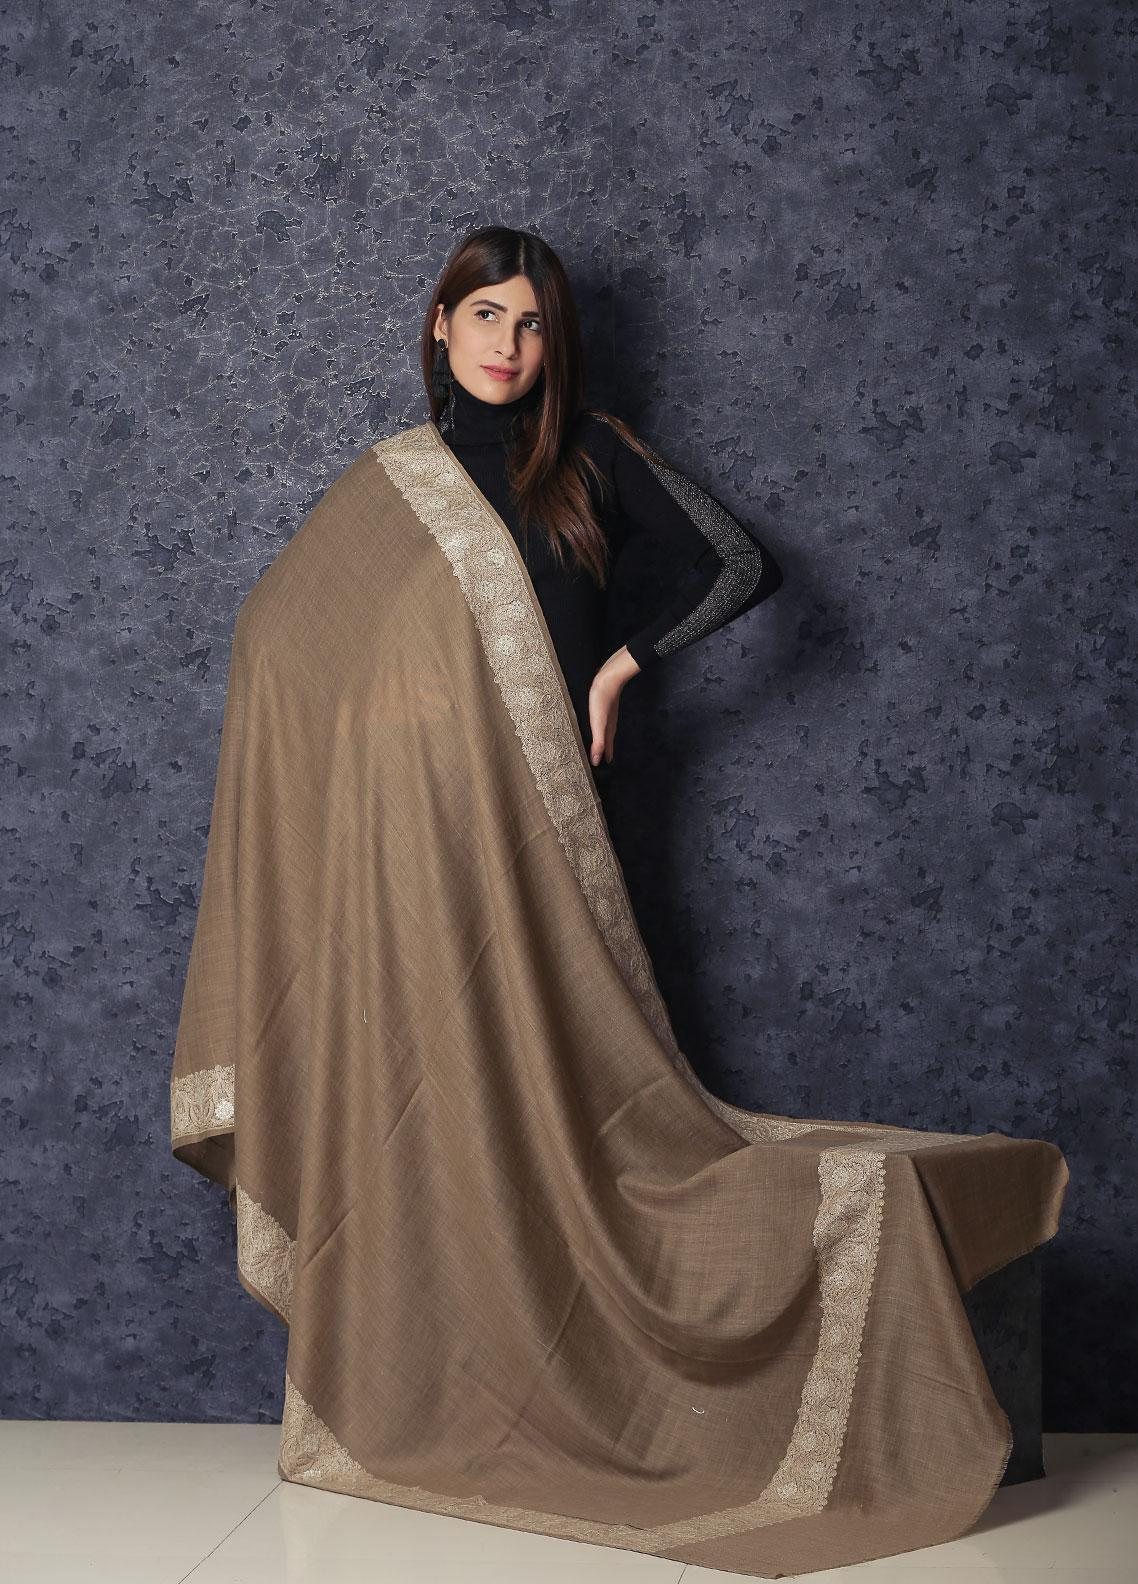 Sanaulla Exclusive Range Embroidered Pashmina  Shawl MIR-221 Brown - Kashmiri Shawls